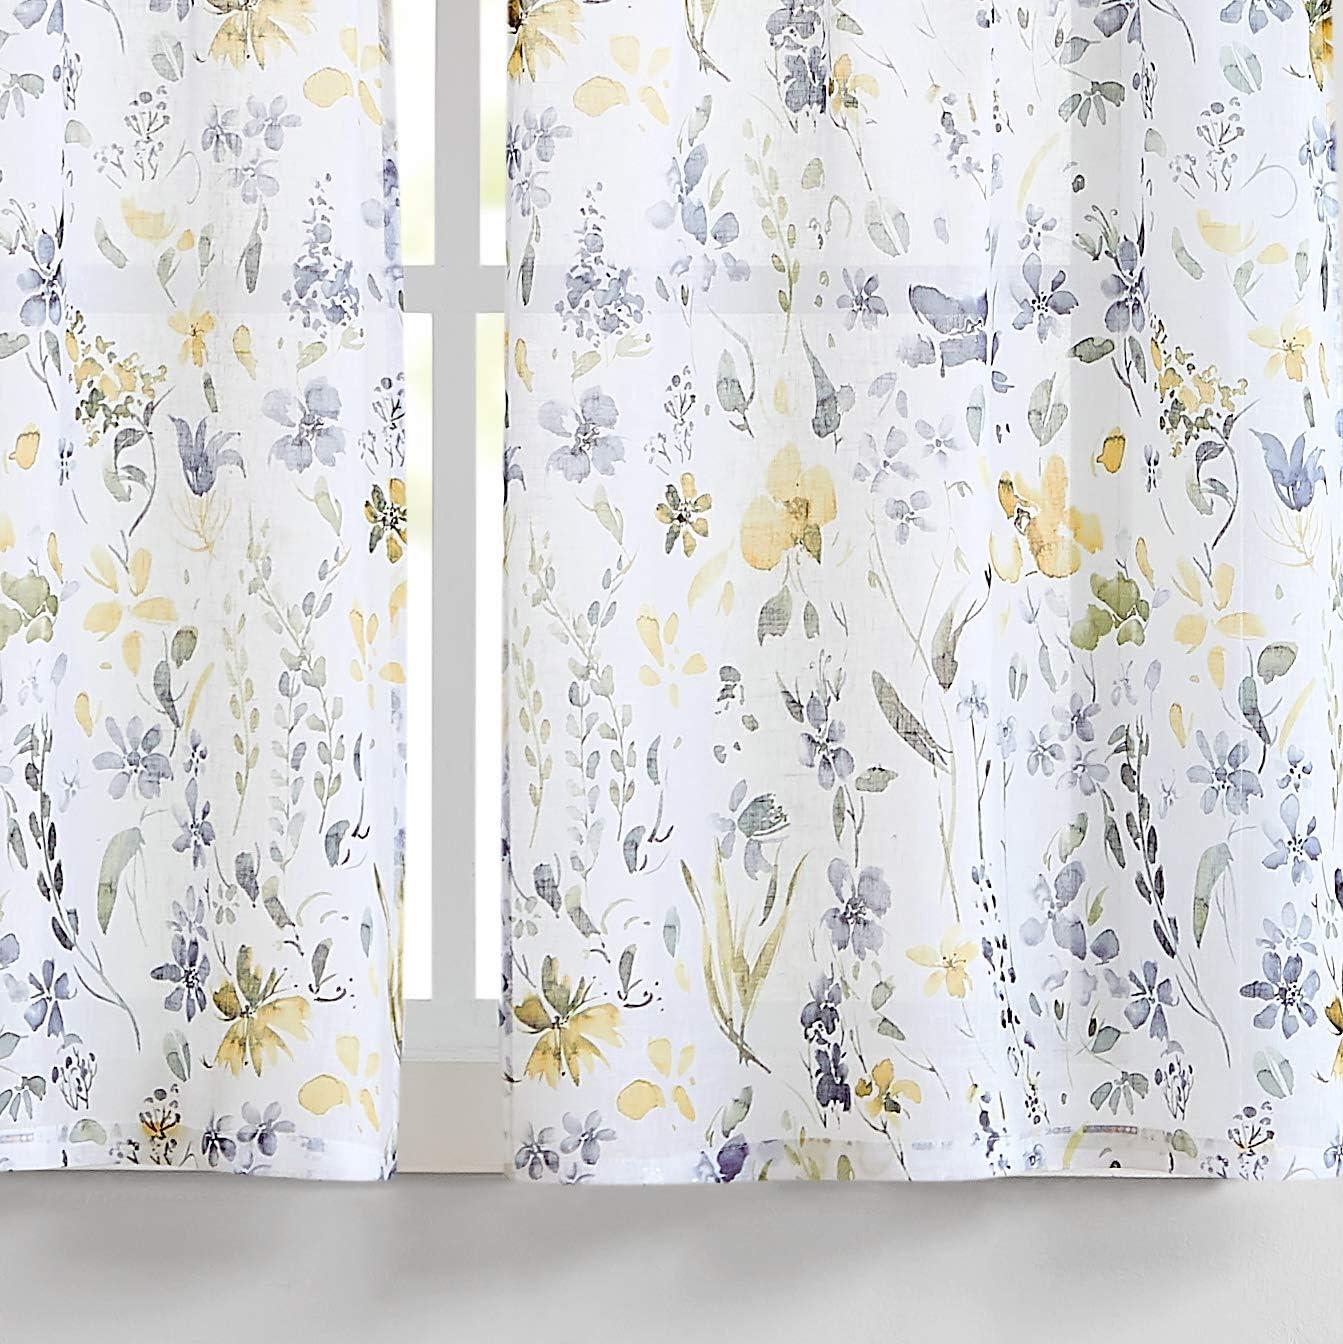 "Fragrantex Yellow Flower Print Tier Curtains 45 inch Length Multi-Color Linen Texture, Rustic Farmhouse Style Curtains, Window Floral Curtains Tiers 28"" W x 45"" L,2 Panels Rod Pocket"